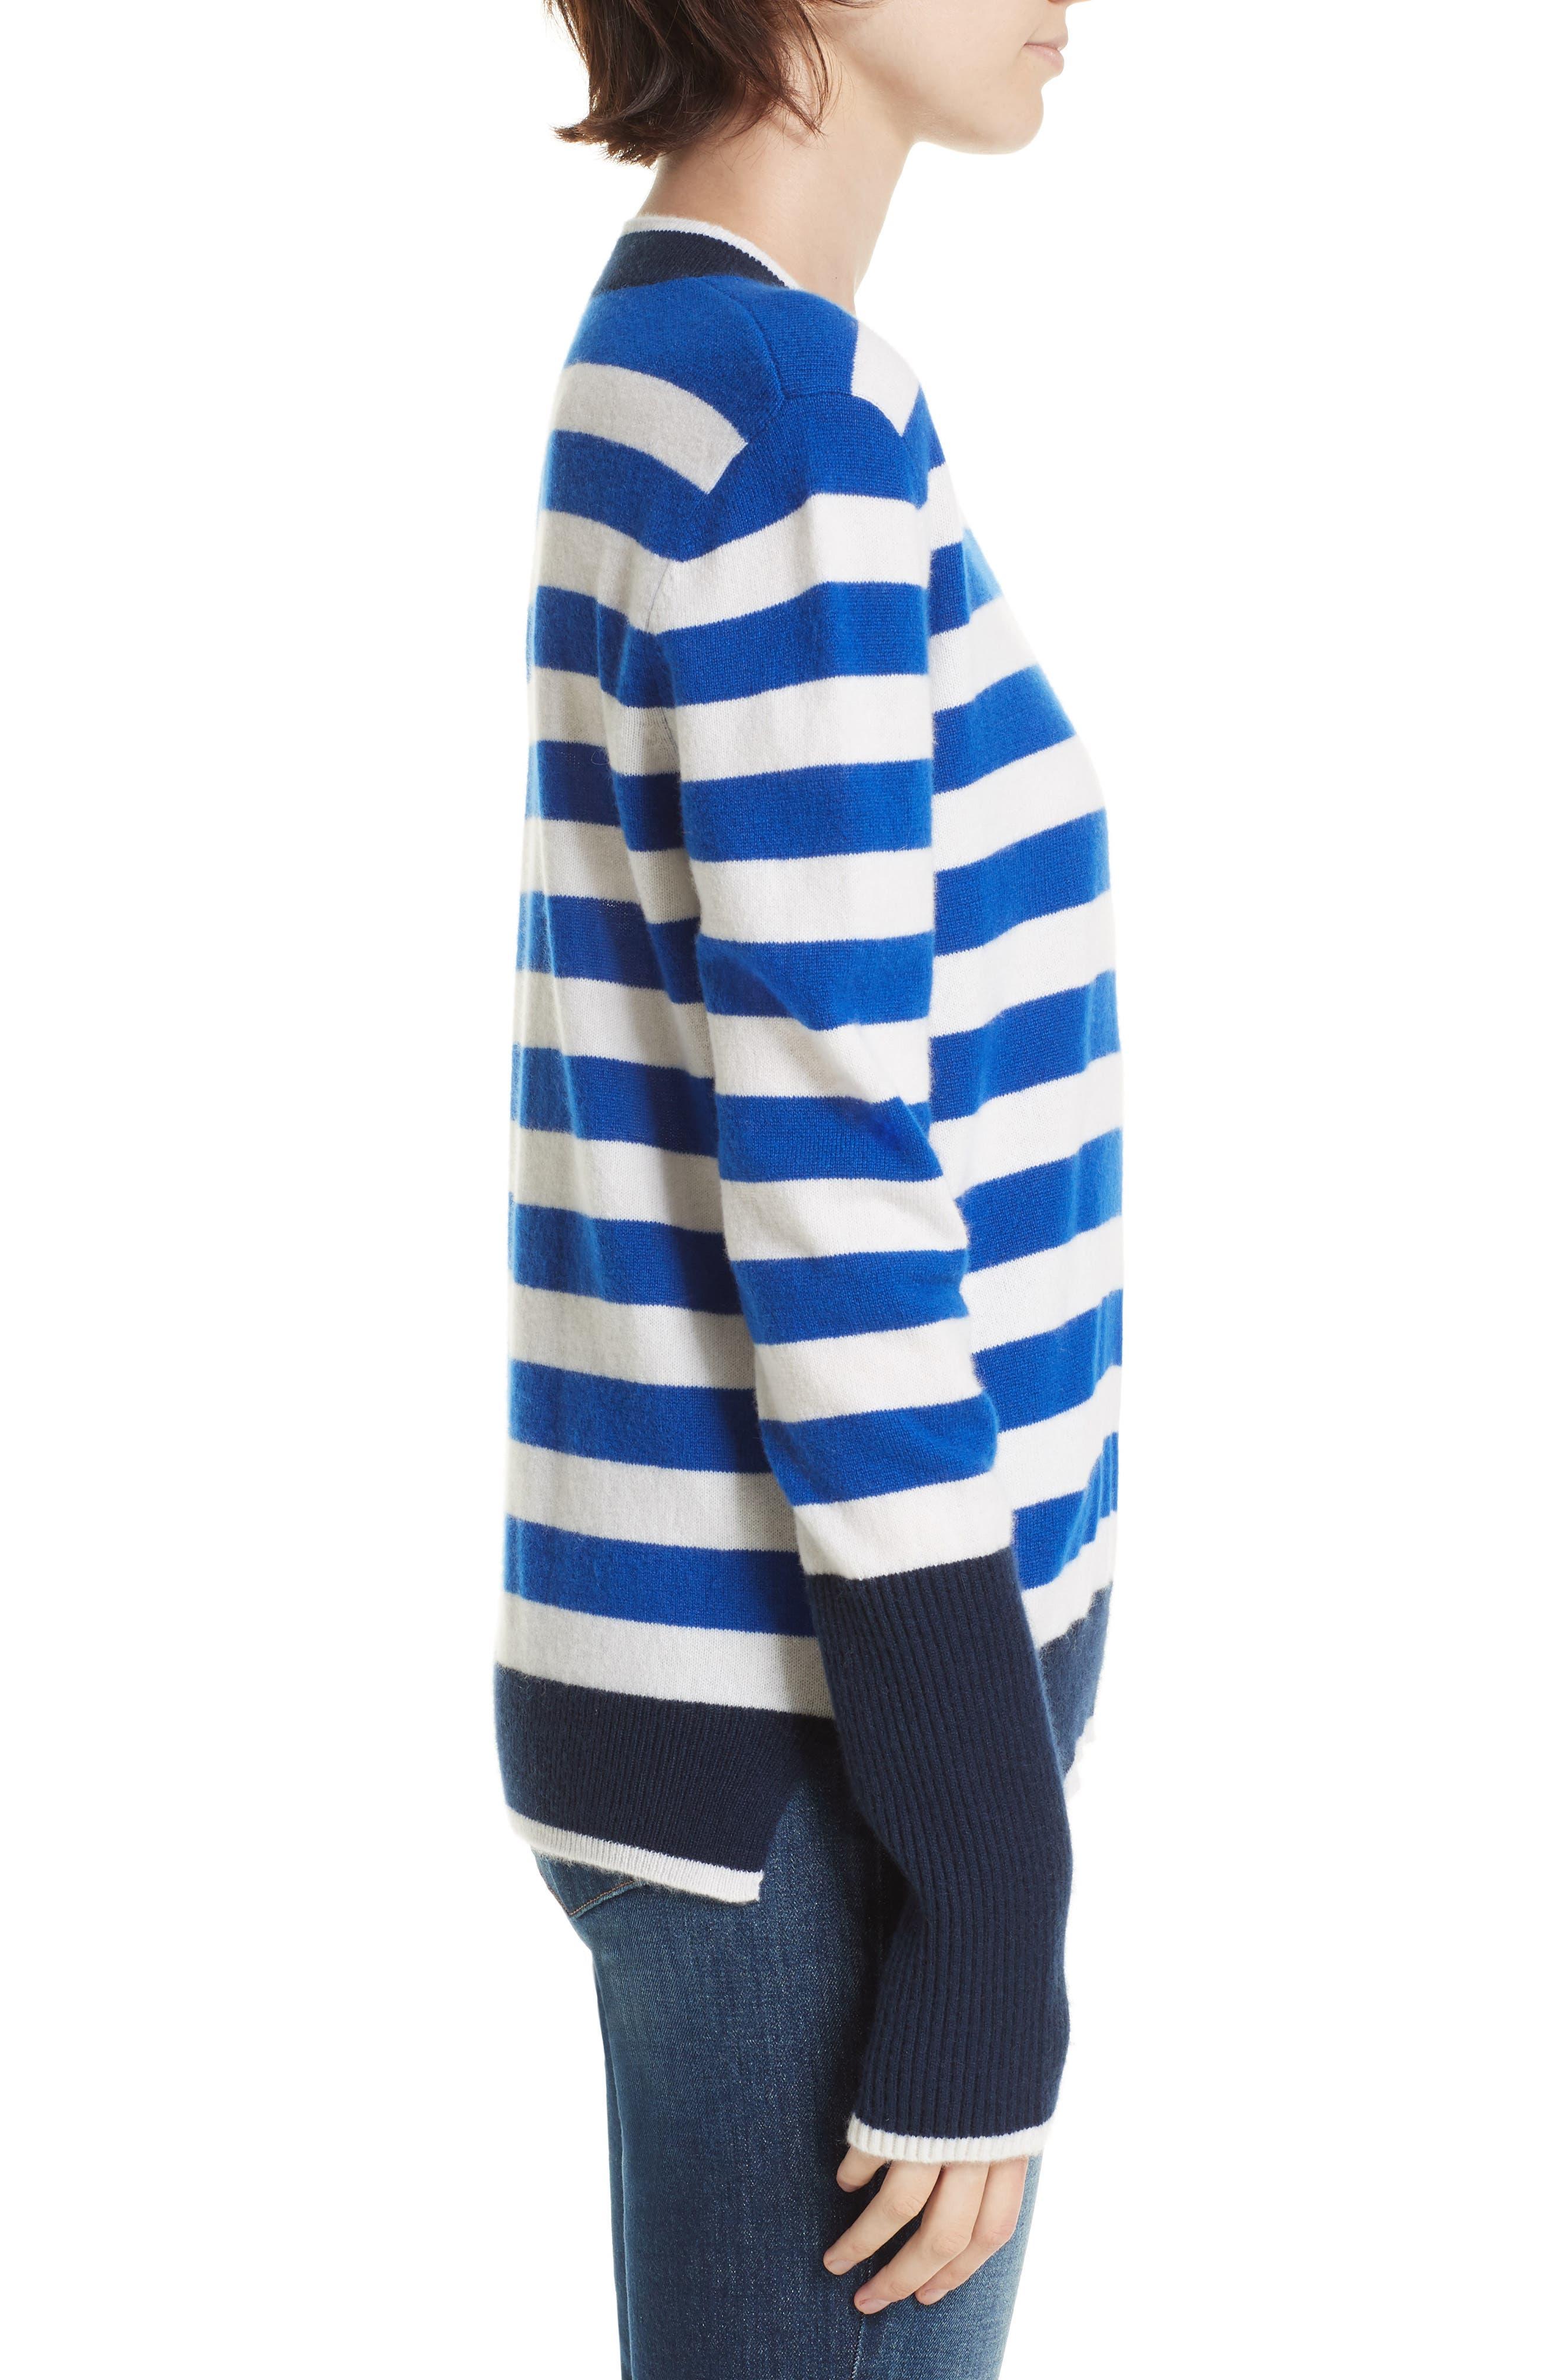 L'Universite Cashmere Sweater,                             Alternate thumbnail 3, color,                             BRIGHT BLUE/ CREAM/ NAVY